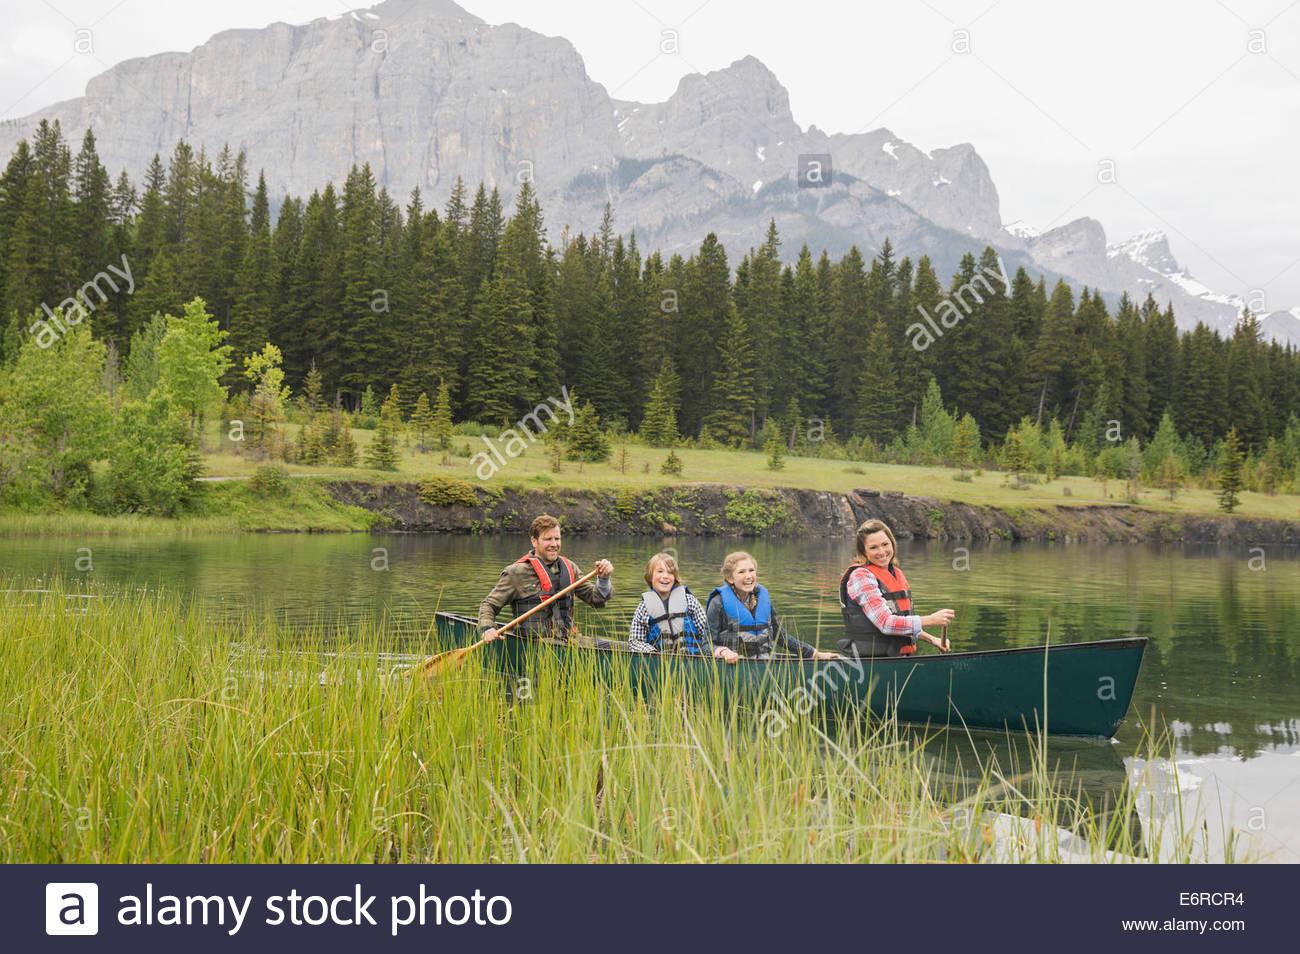 Family rowing canoe in still lake - Stock Image